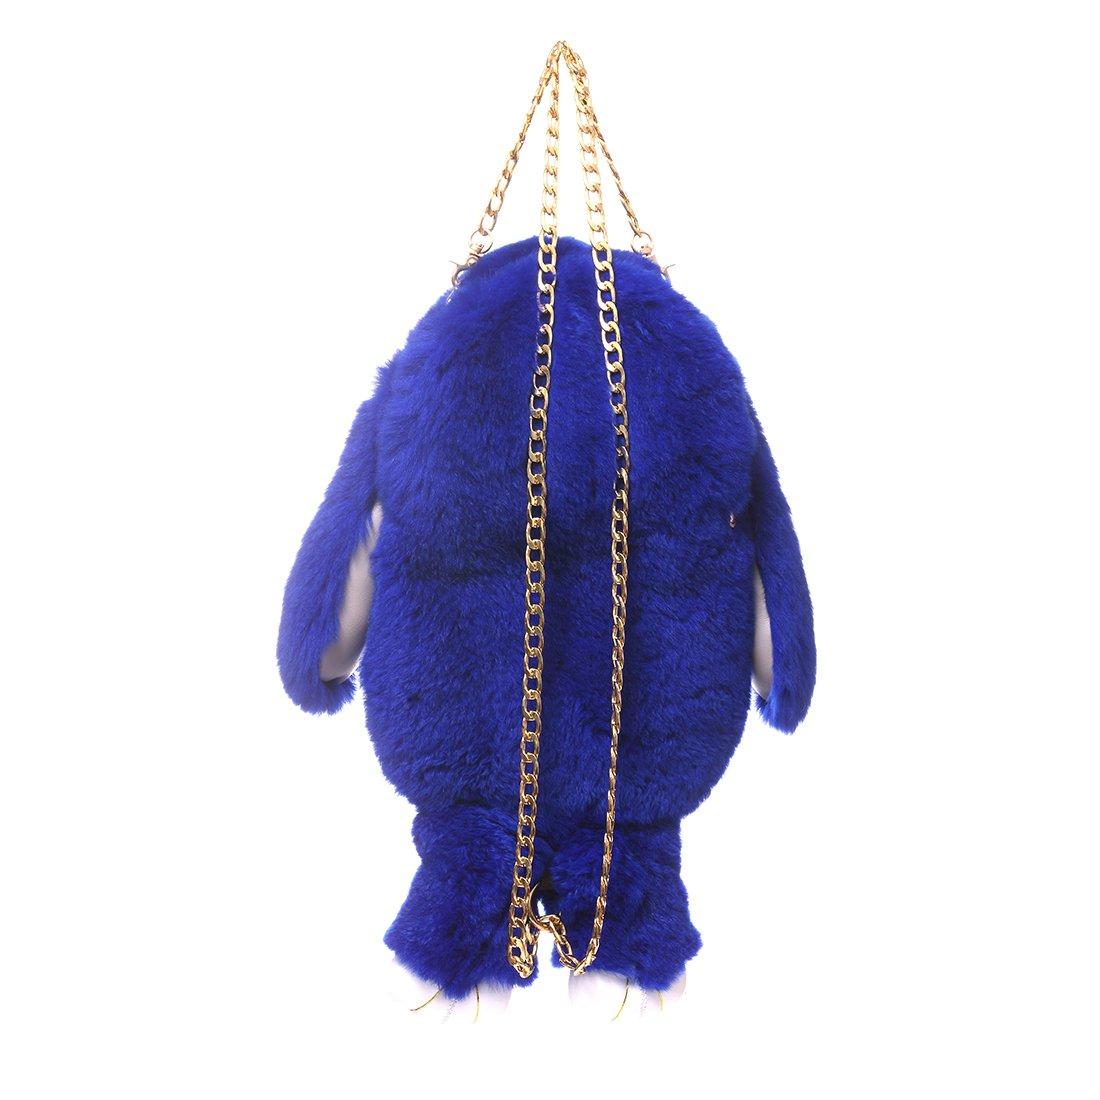 Amazon.com  URSFUR Kids Bunny Hare Backpack Rabbit Fur Shoulder Bags Plush  Doll Knapsack Toy blue  URSFUR 16e5654c821f8